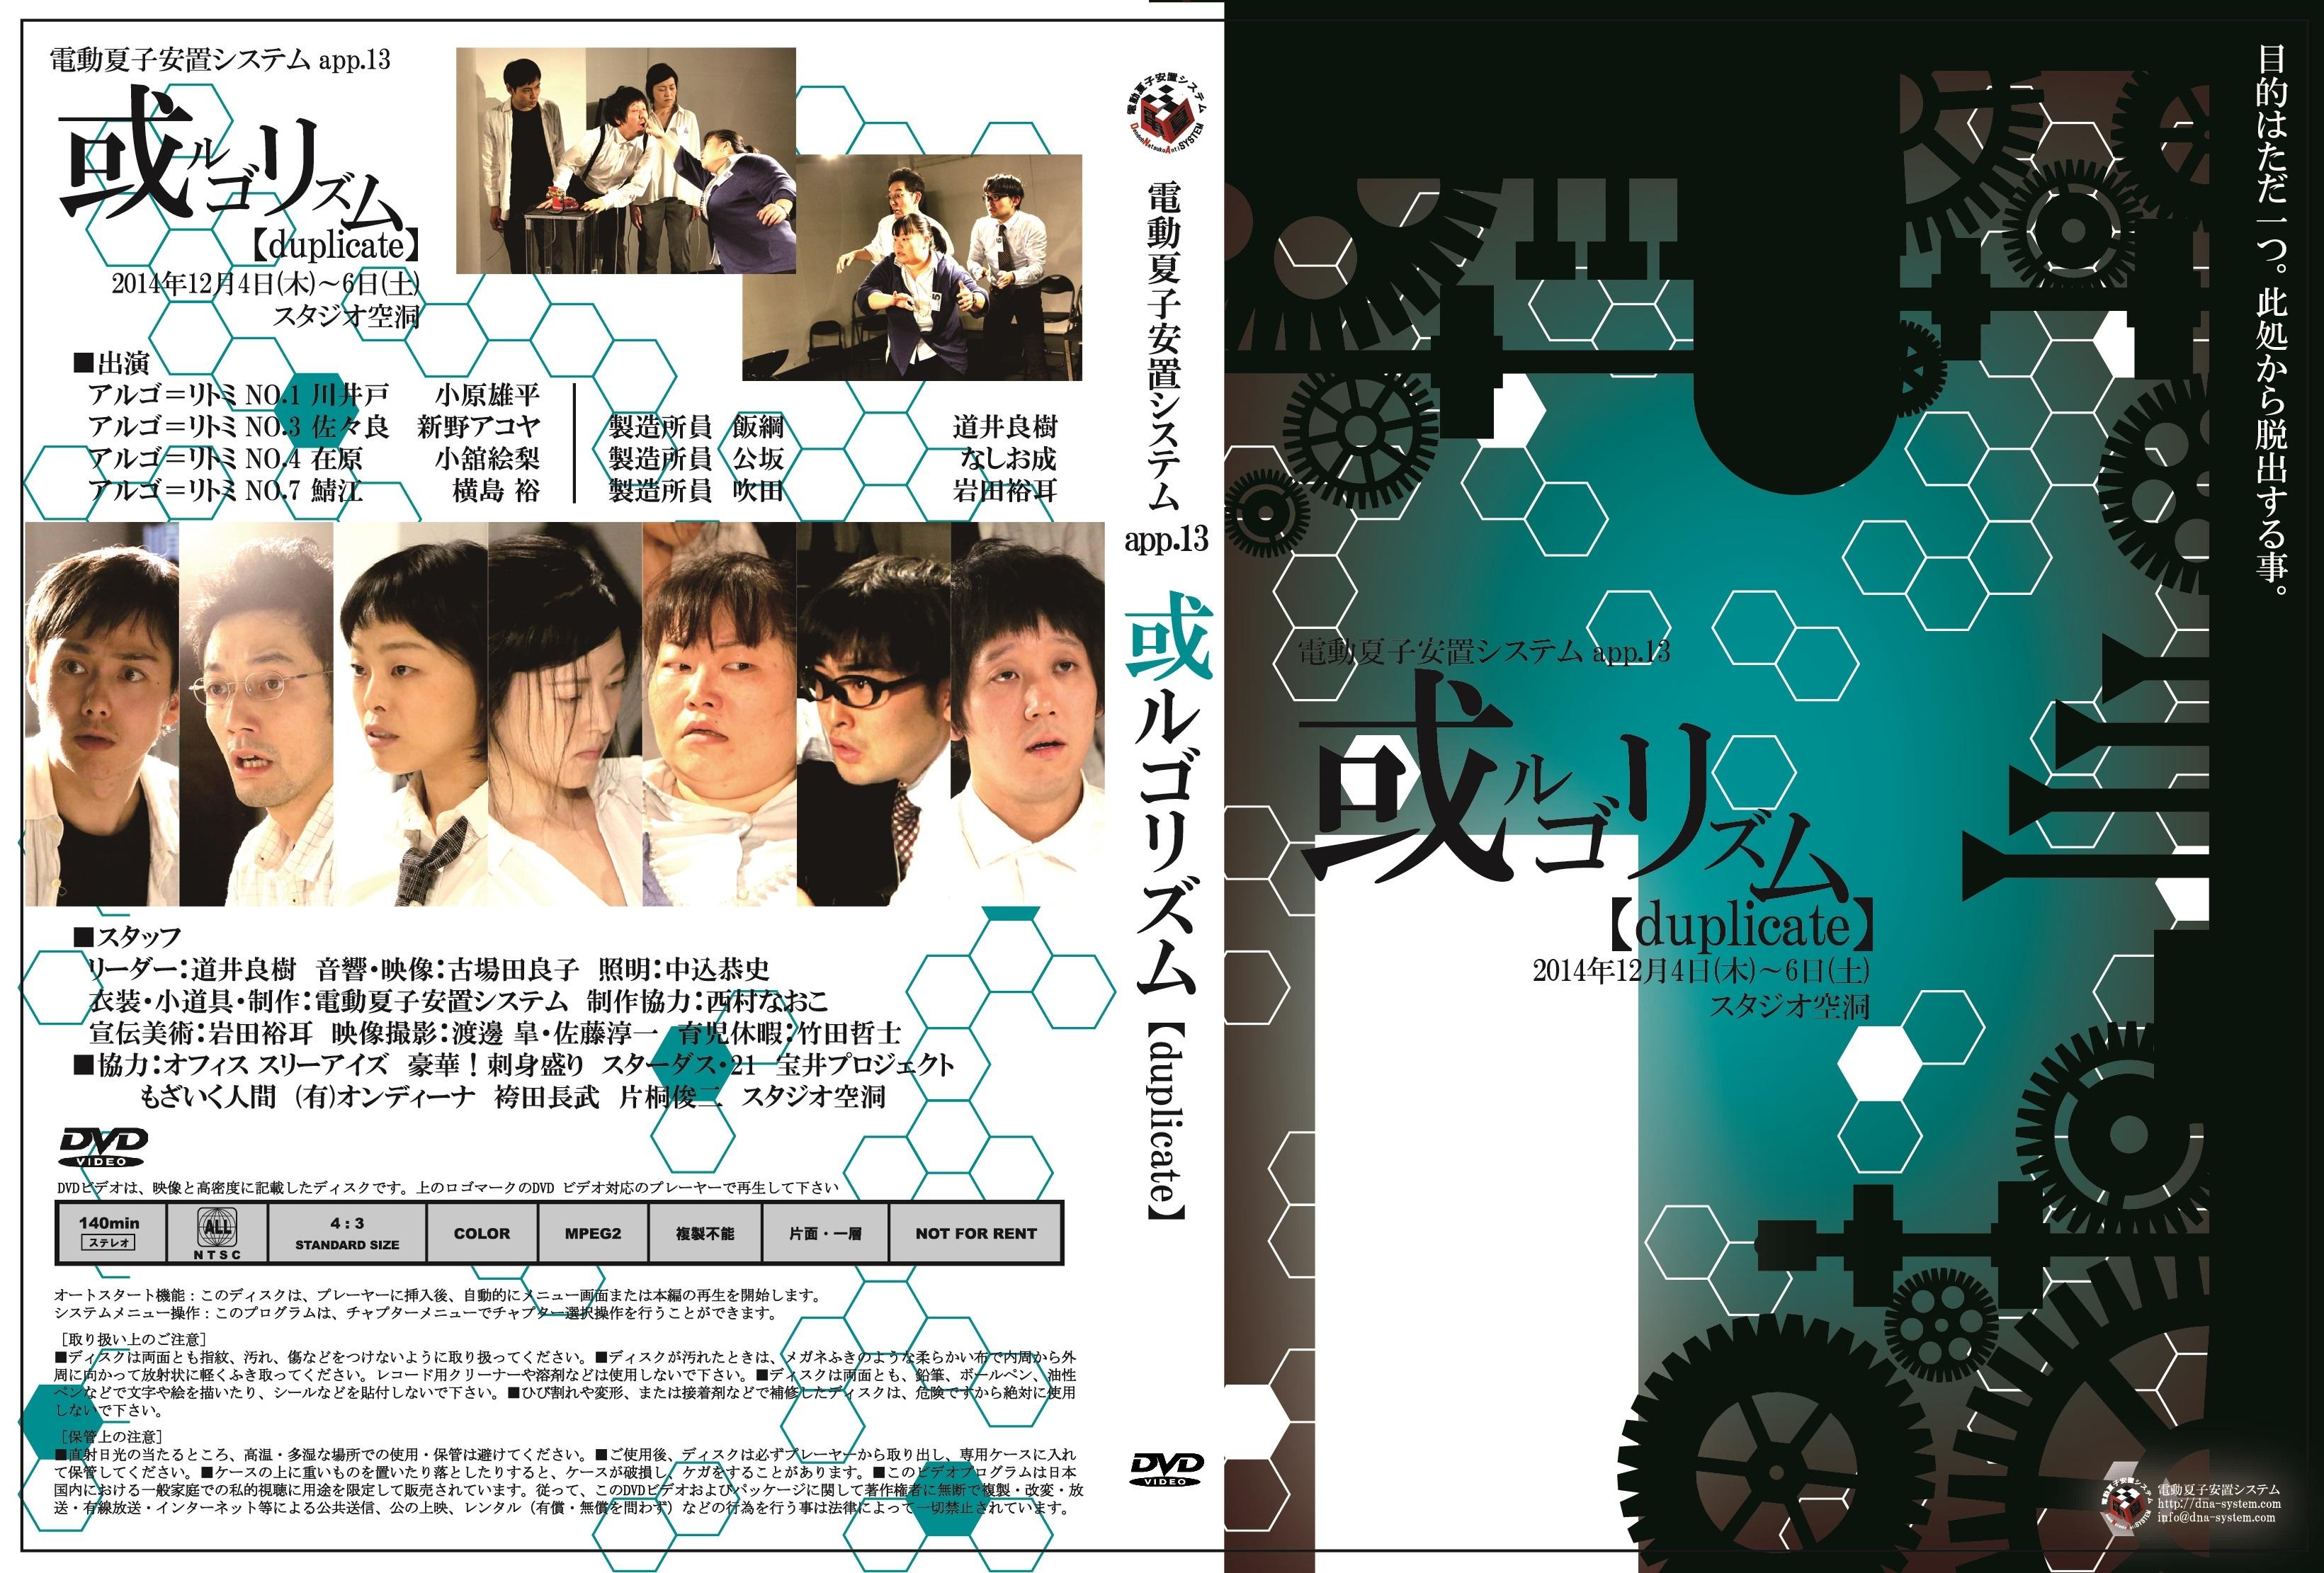 DVD 番外公演app.13『或ルゴリズム【duplicate】』